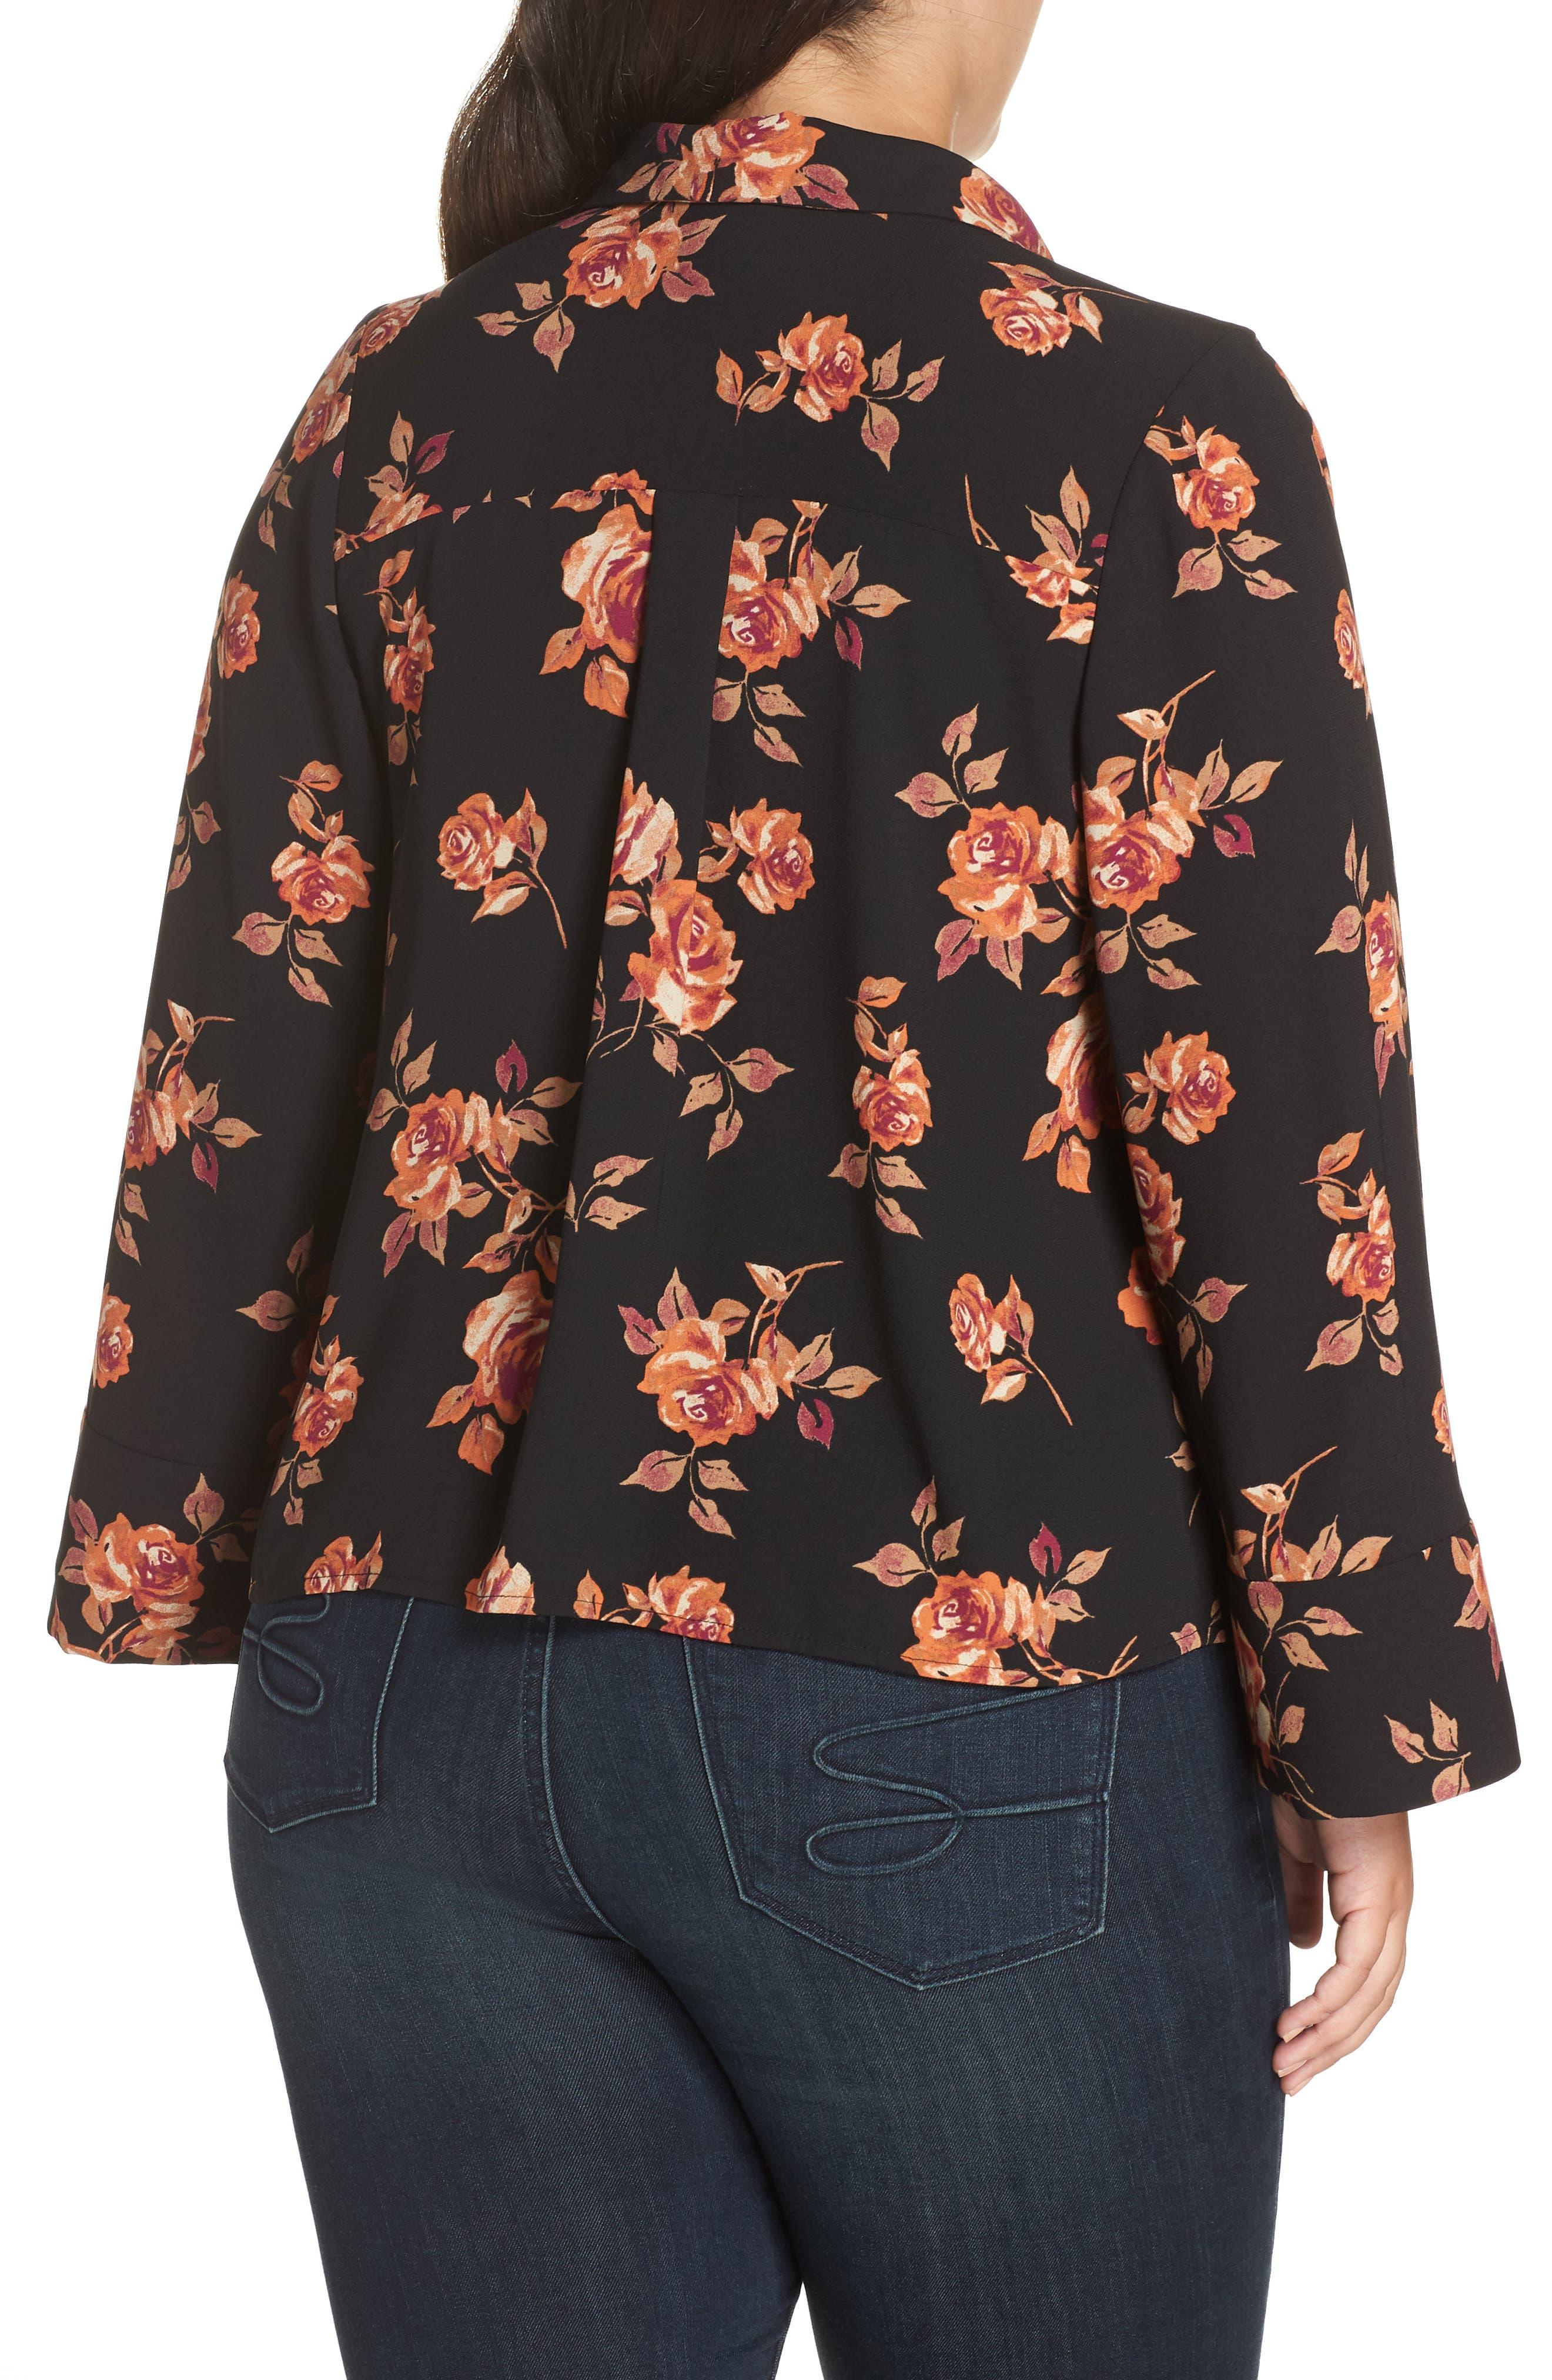 Notched Collar Floral Print Shirt,                             Alternate thumbnail 2, color,                             BLACK POP FLORAL